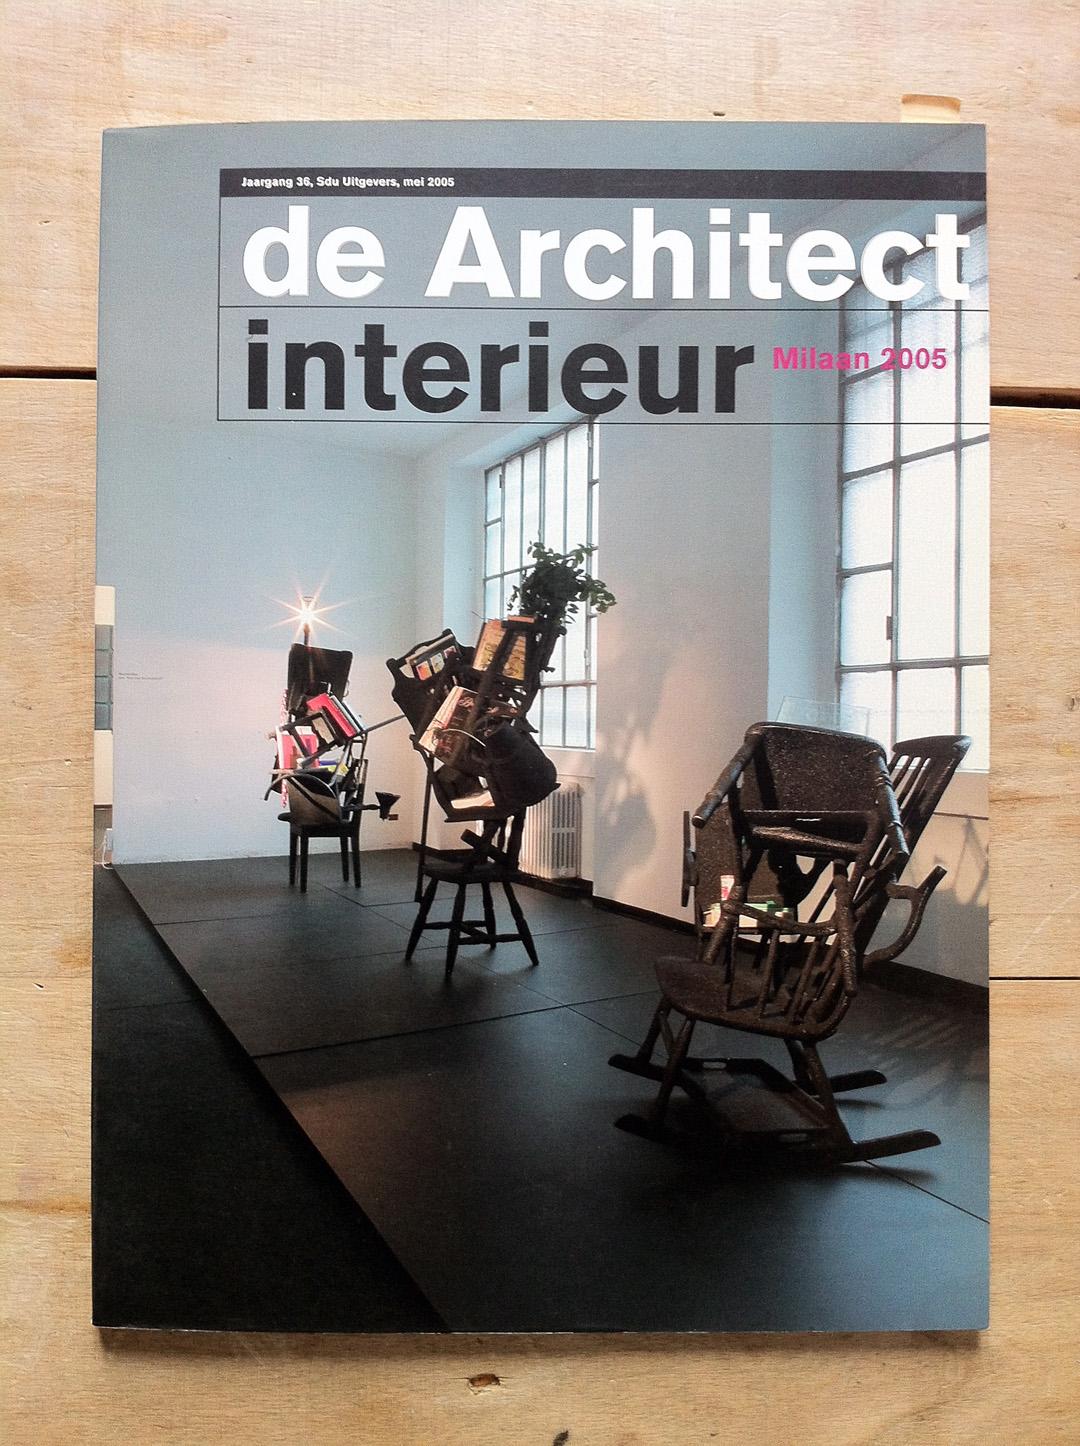 01_de_architect_01-1.jpg